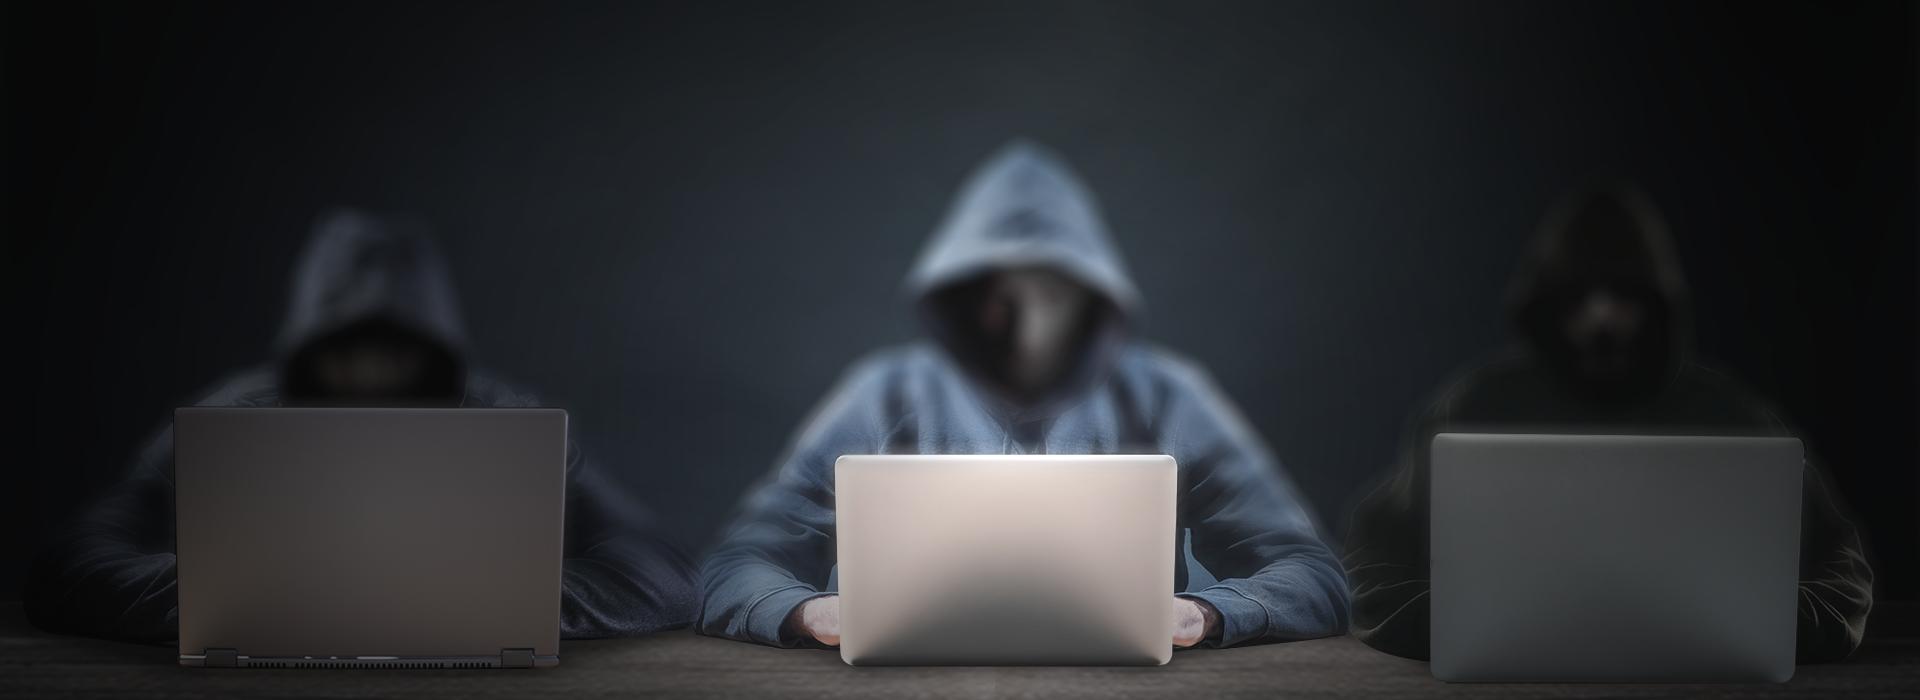 Deception_Cyber_Security